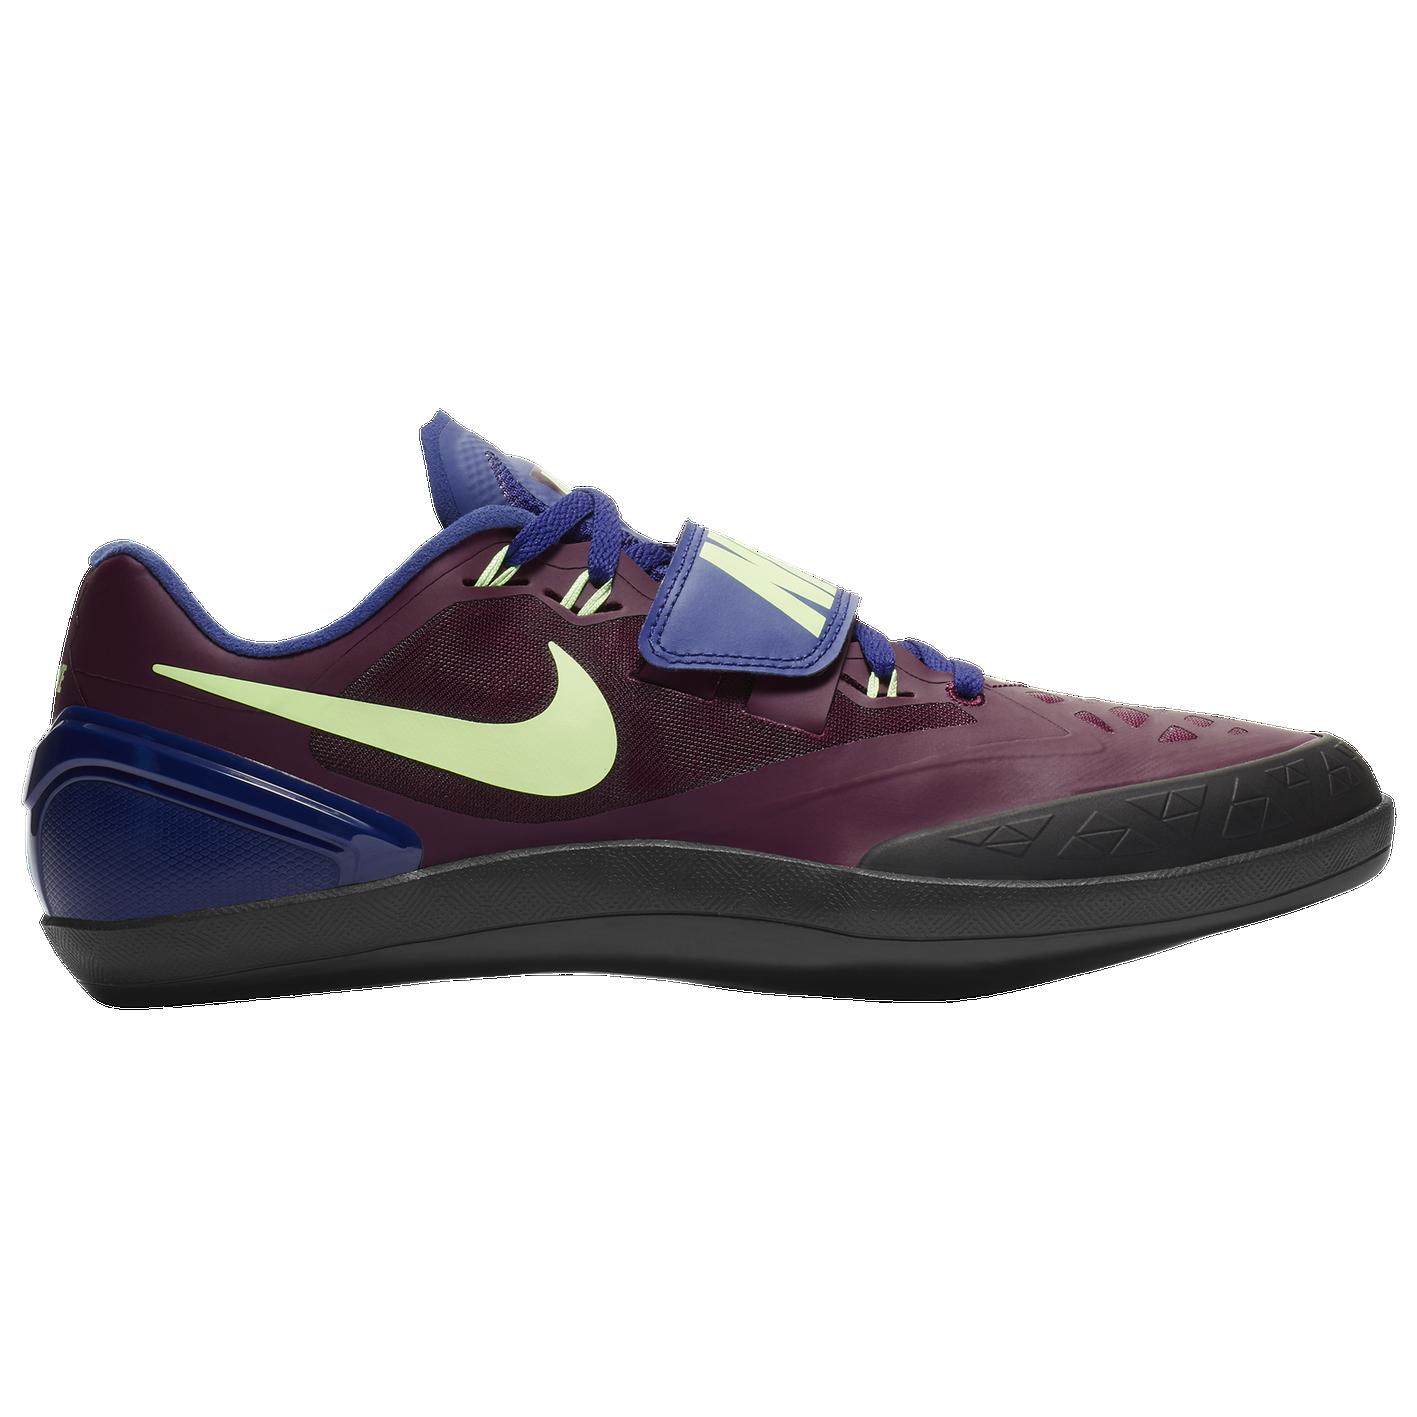 61c1cecb8469 Nike Zoom Rotational 6 - Men s - Track   Field - Shoes - Bordeaux ...